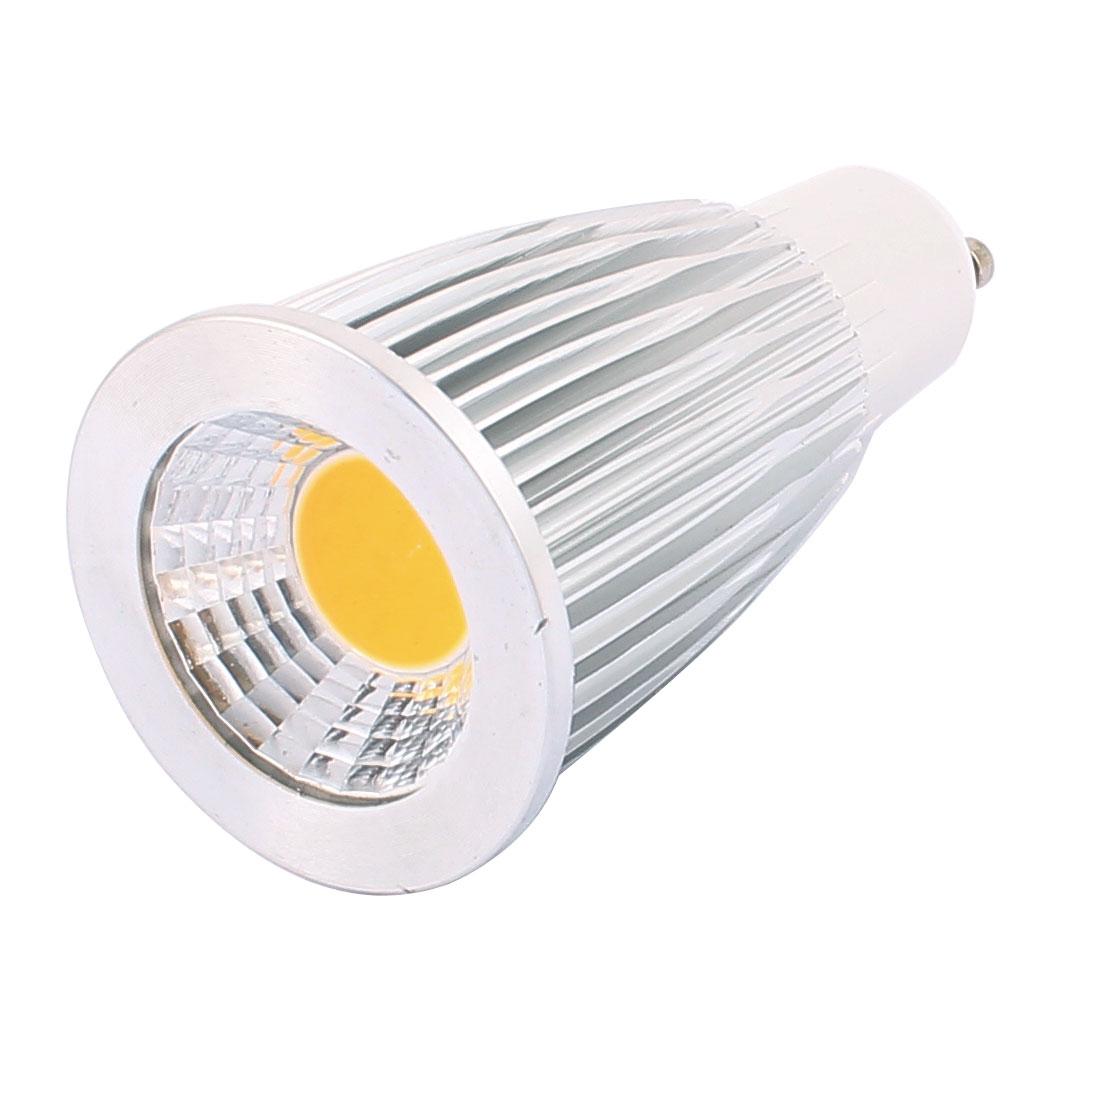 AC85-265V 7W GU10 COB LED Spotlight Lamp Bulb Energy Saving Downlight Warm White